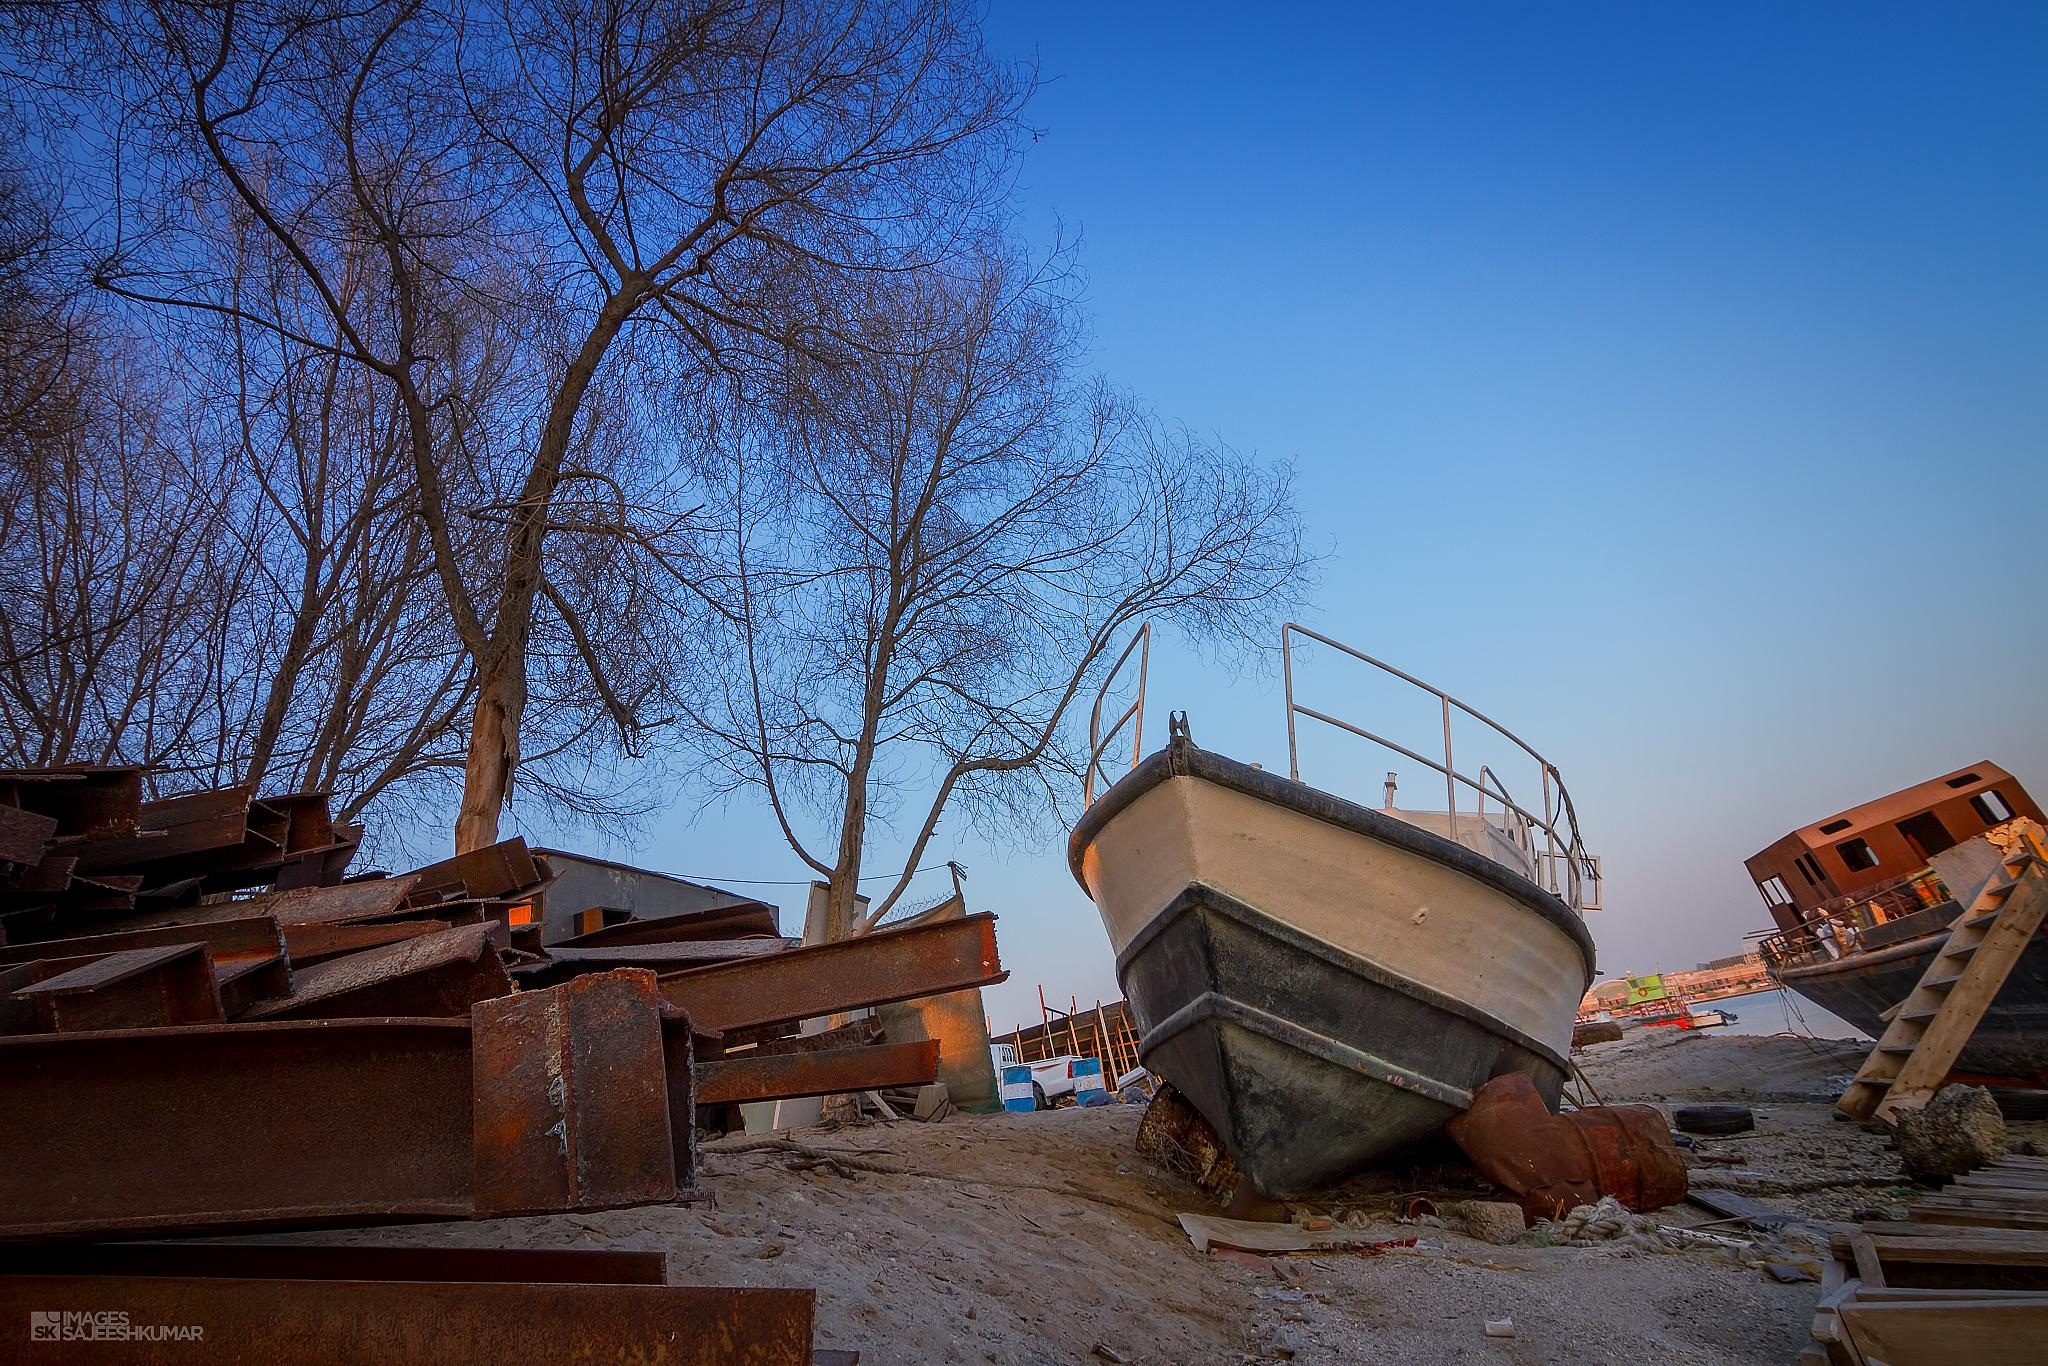 Dockyard by Sajeesh Kumar